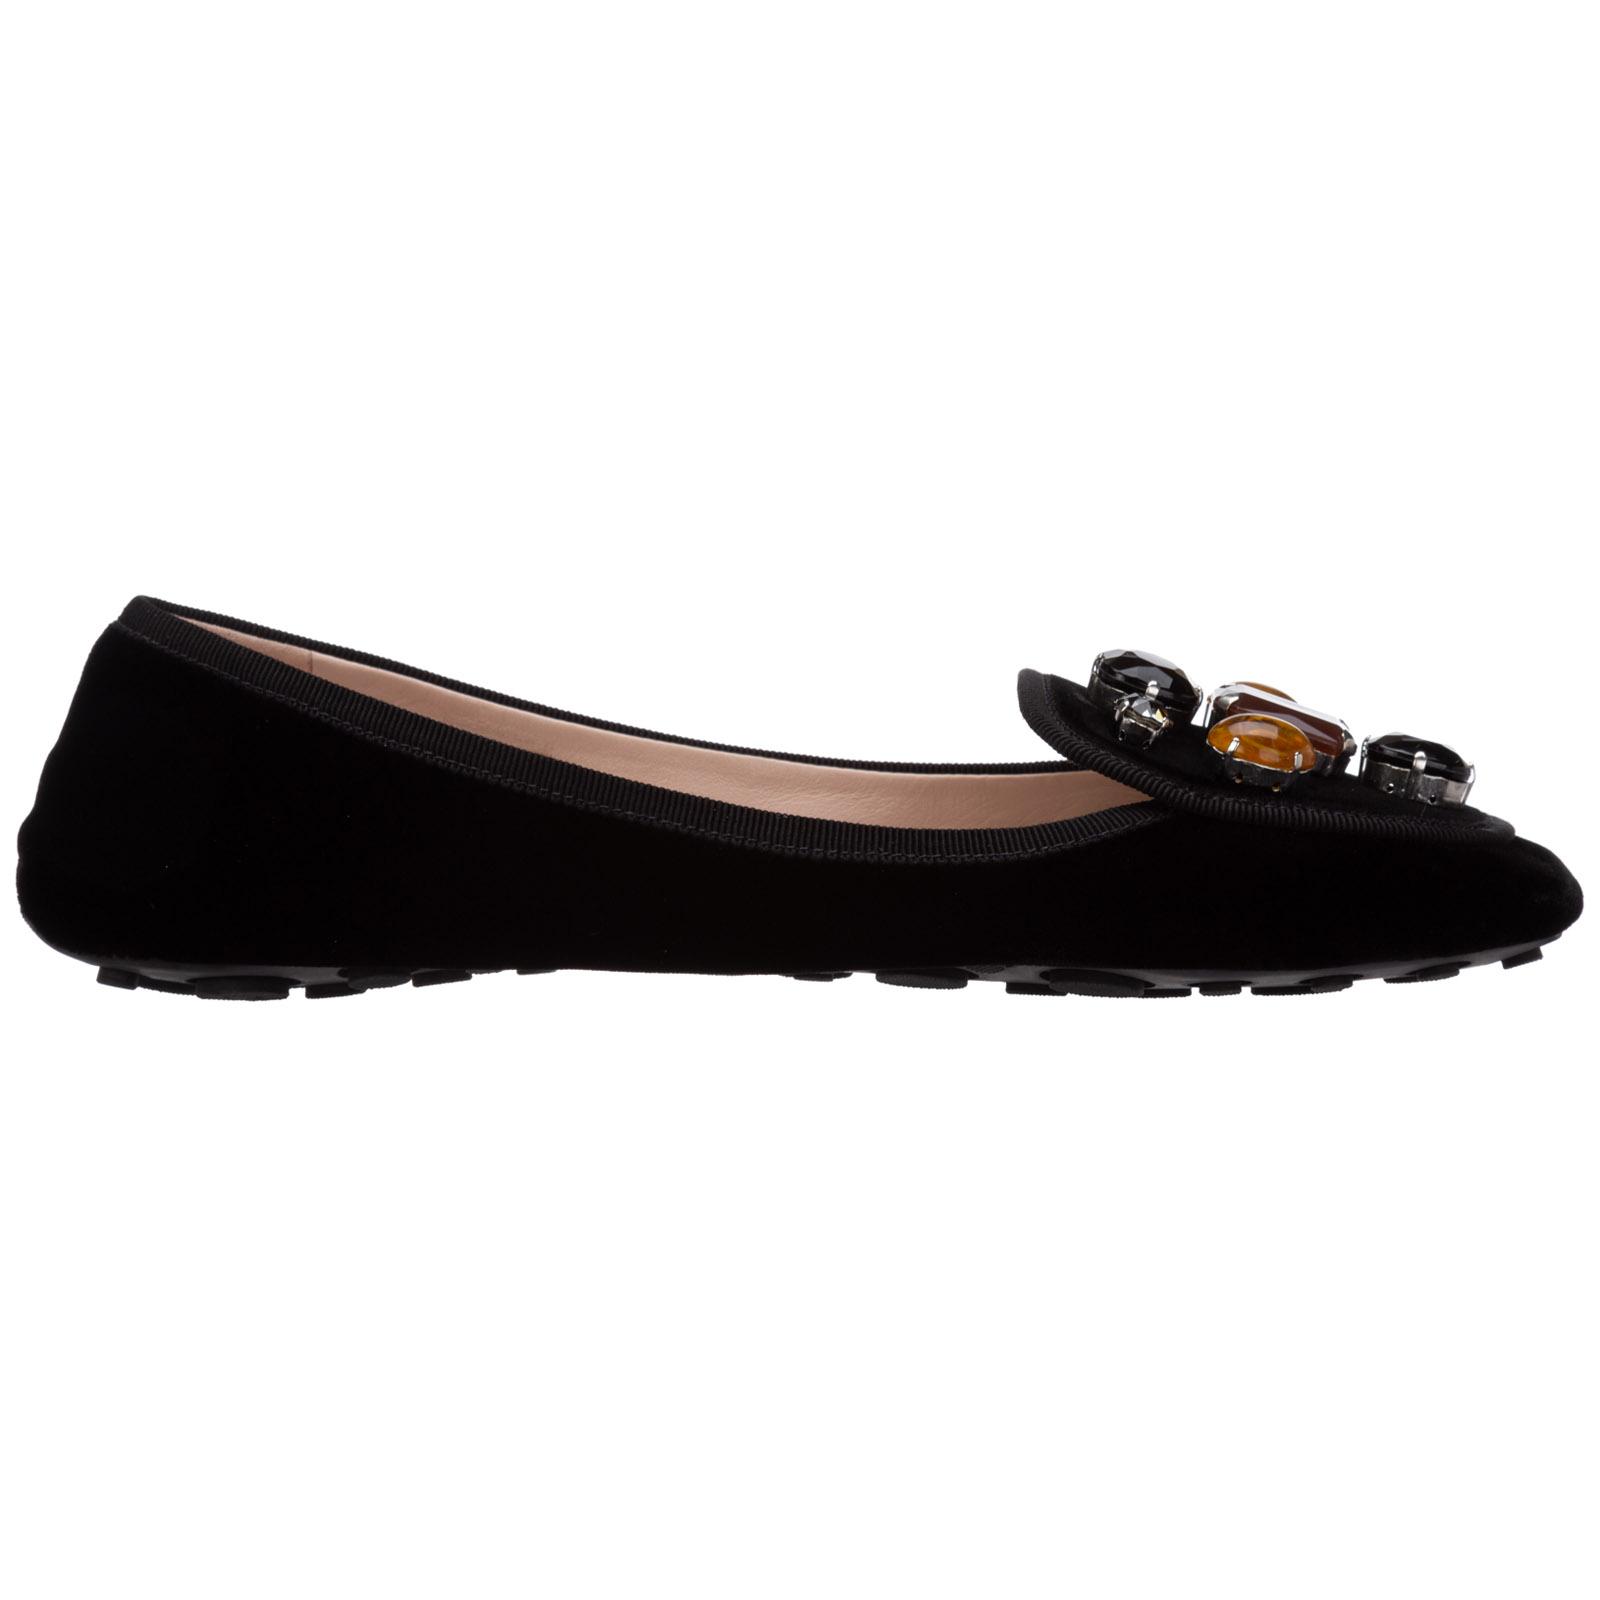 Car Shoe Women's ballet flats ballerinas  - Black - Size: 38